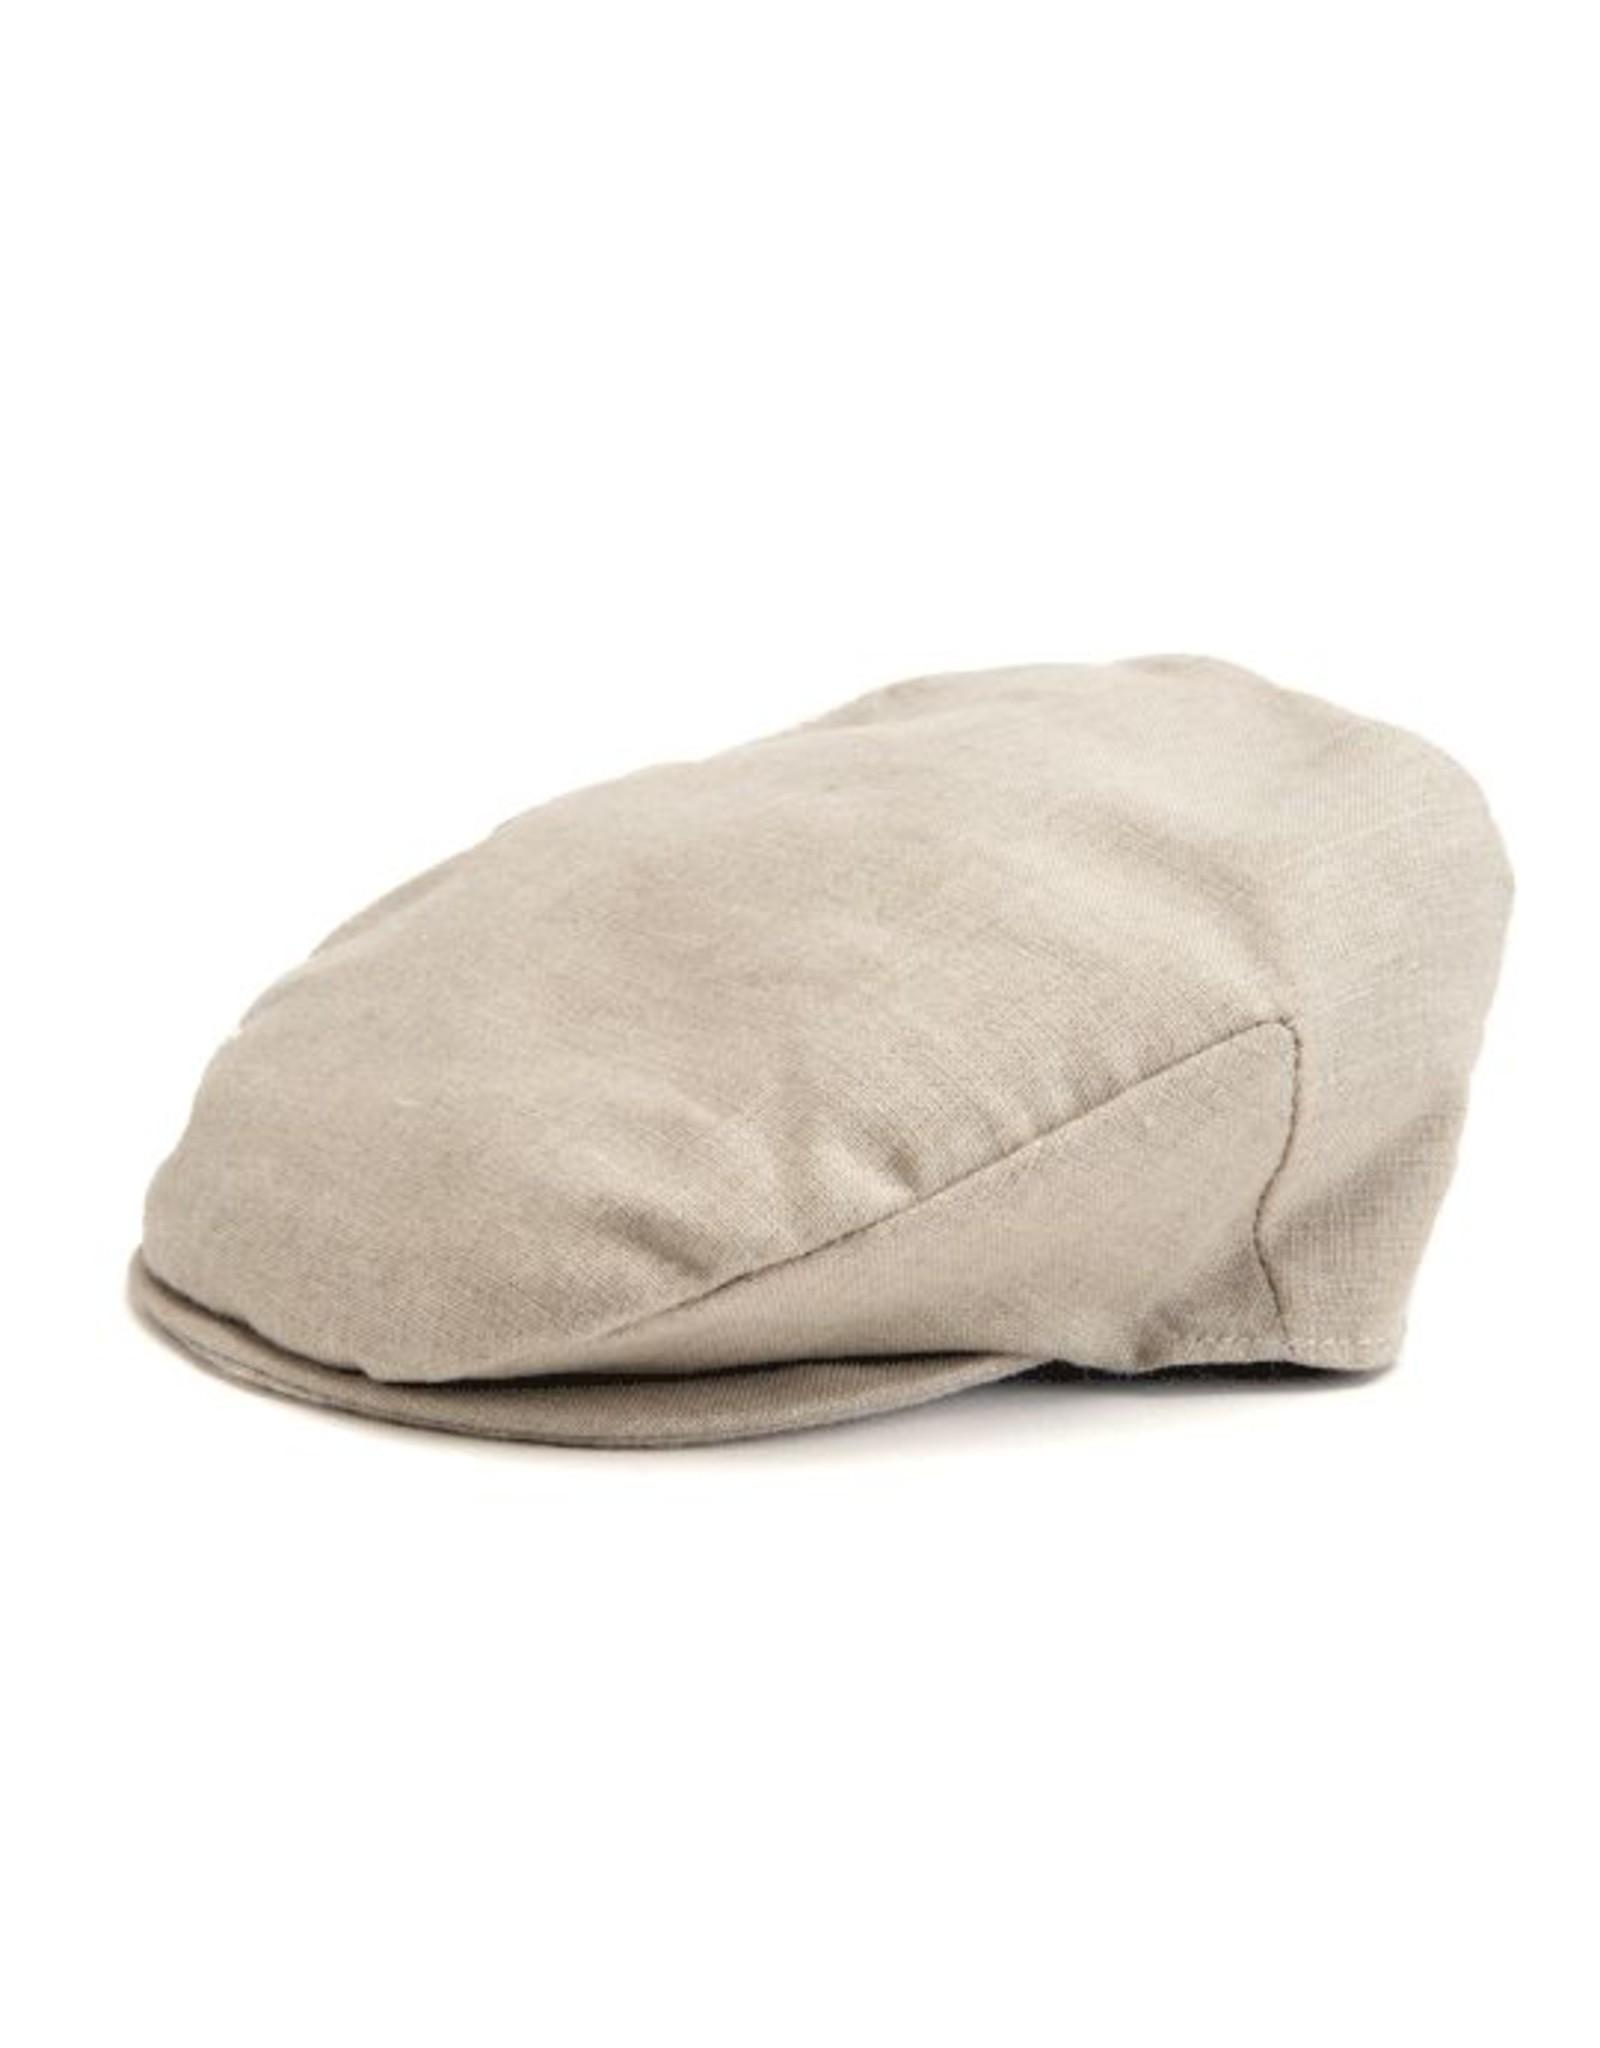 Hanna Hats Hanna Hats Vintage Linen Flat Cap